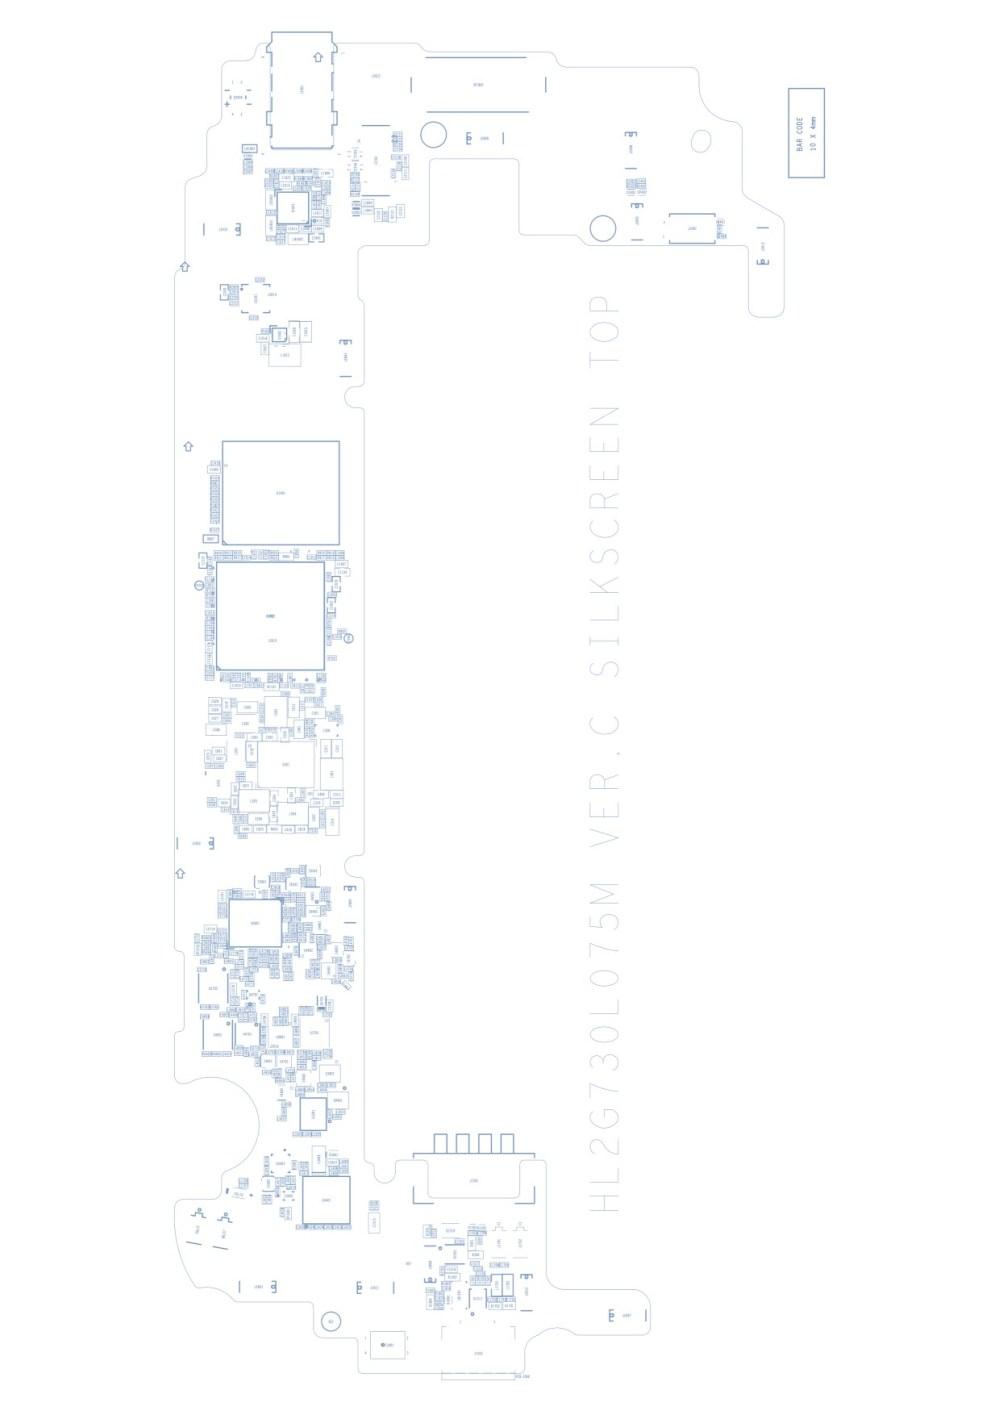 medium resolution of huawei g730 circuit diagram pdf manual de usuario del huawei g730 architecture schematic drawings g730 u30 schematic diagram